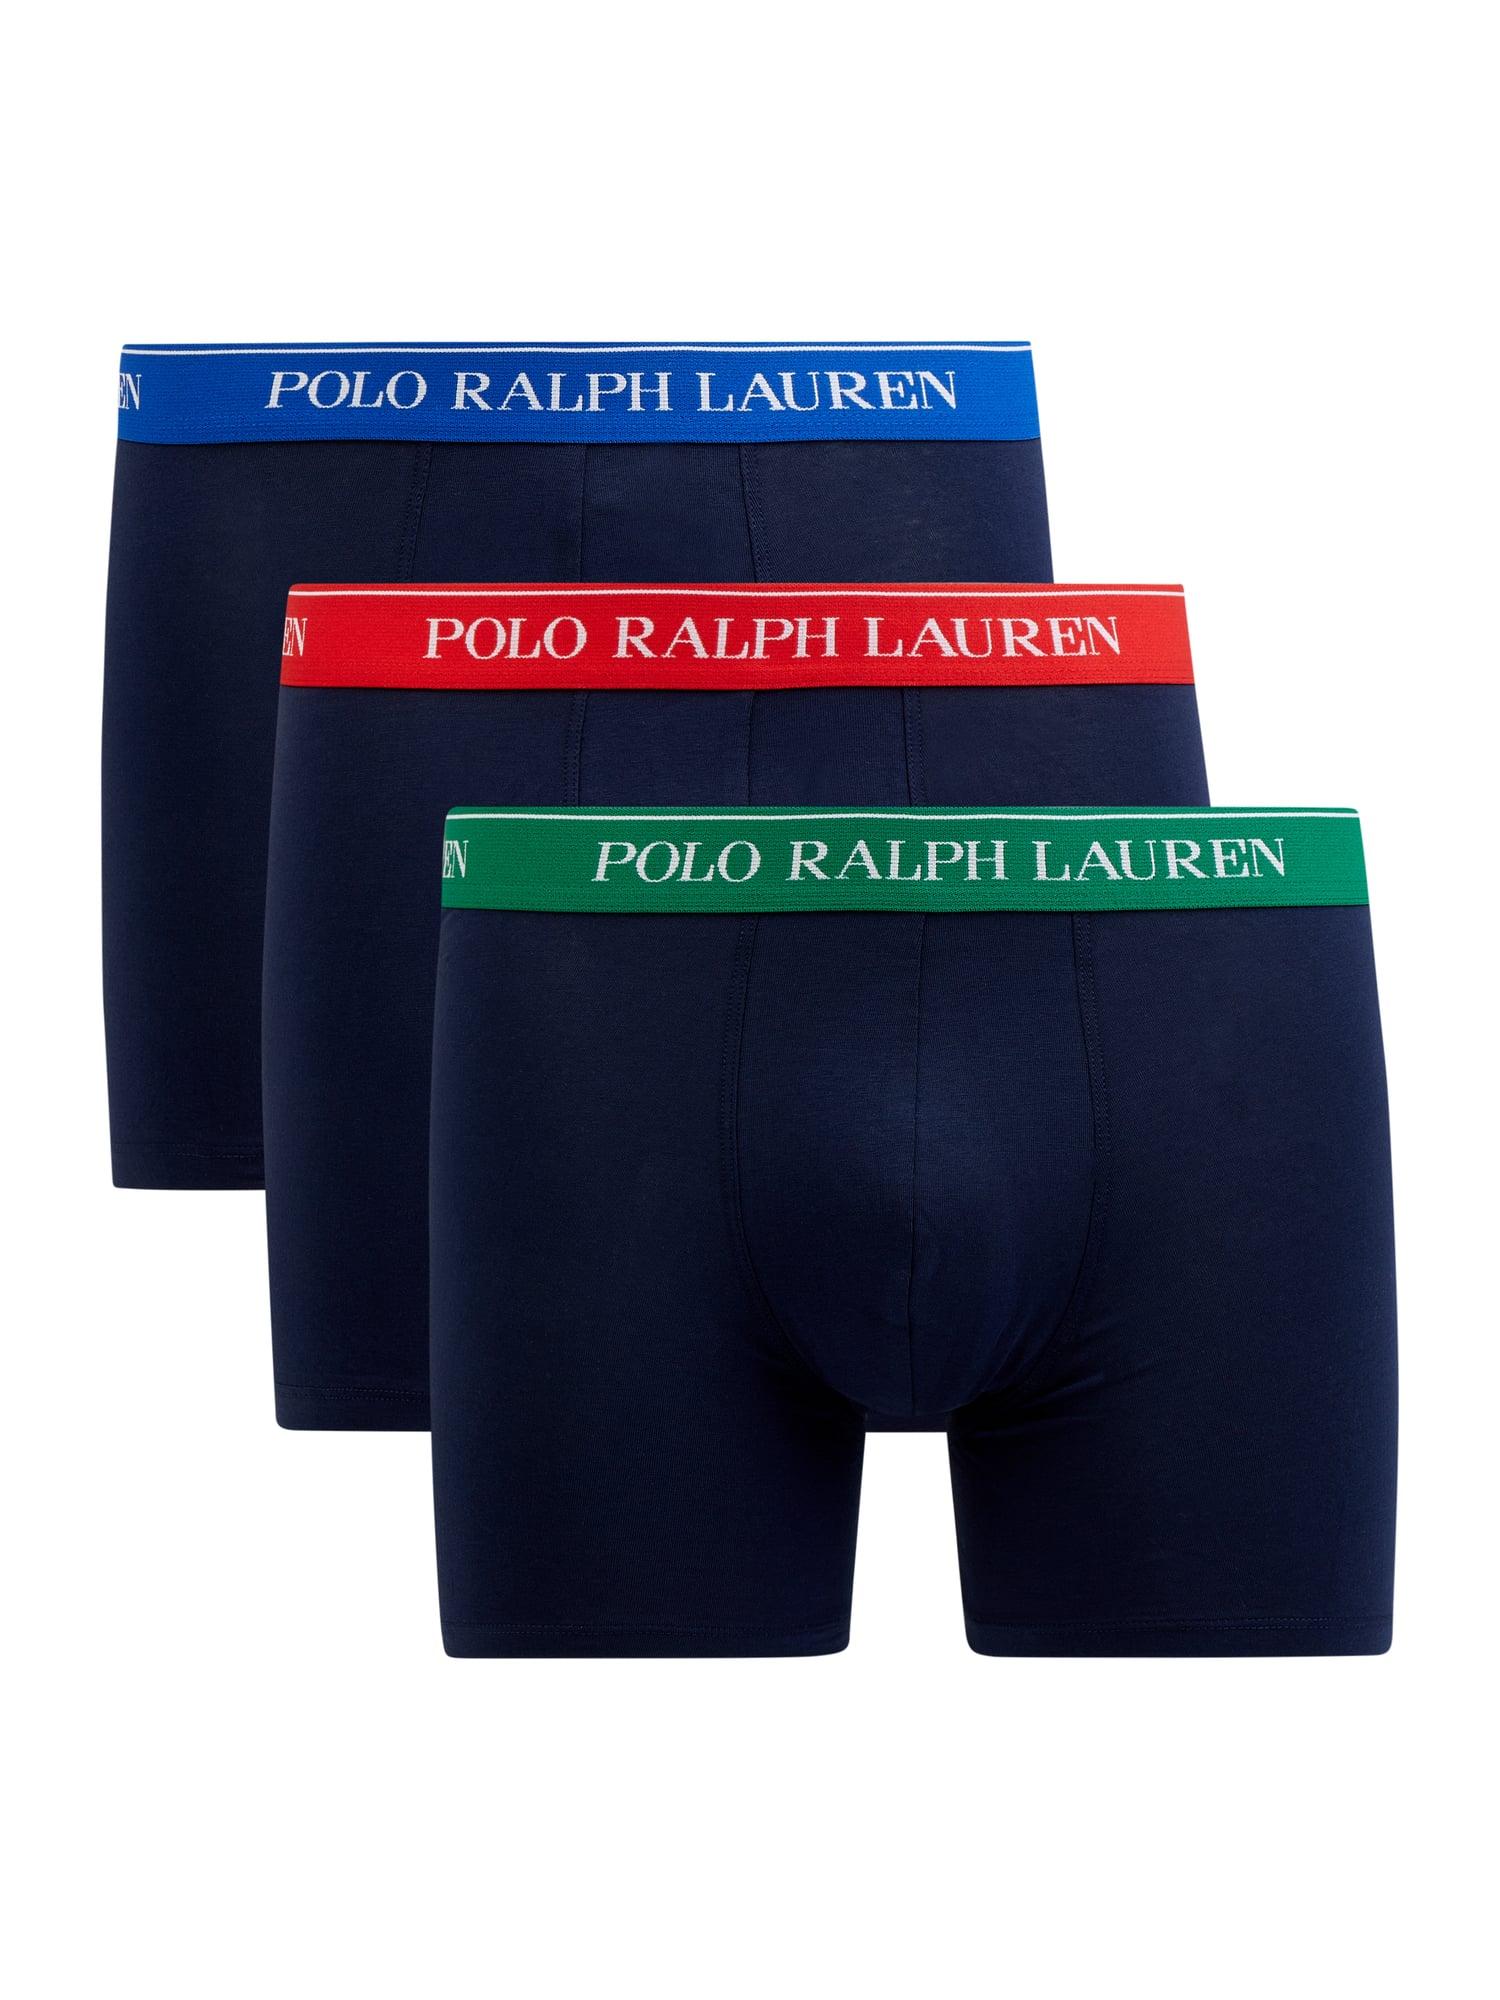 3x Polo Ralph Lauren Boxershorts (L-XXL)